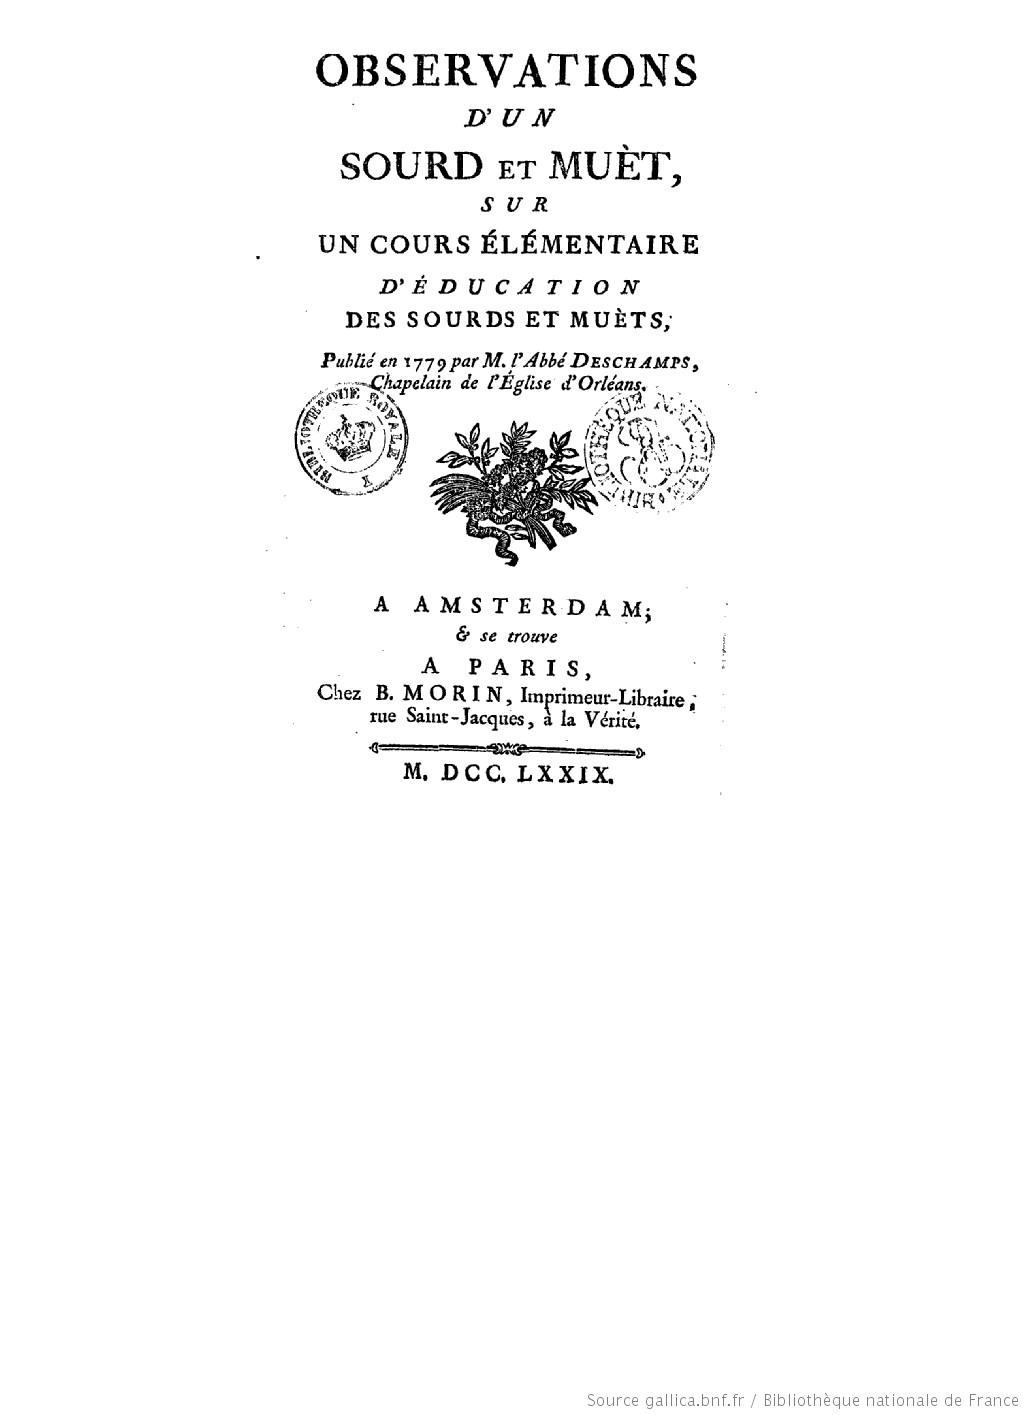 1747 - 1799  : Pierre Desloges